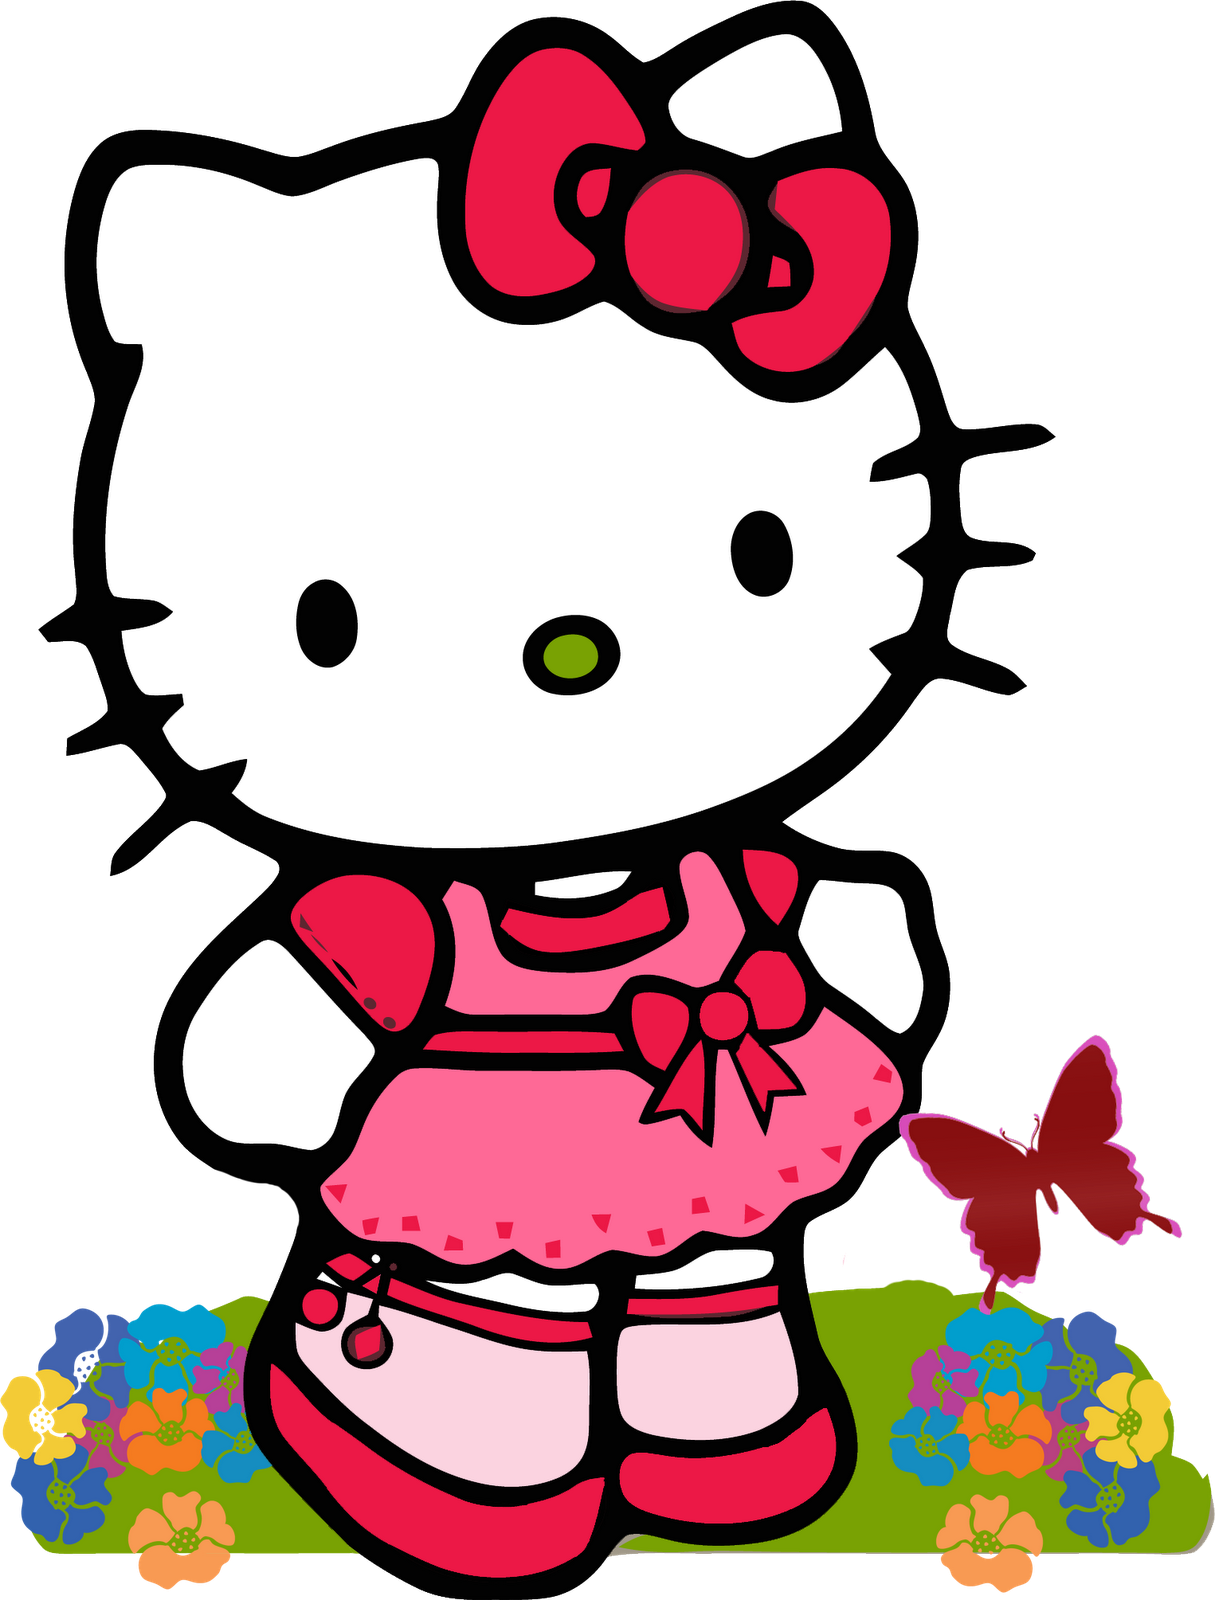 Hello kitty 1st birthday clipart graphic library Hello Kitty Birthday - ClipArt Best graphic library